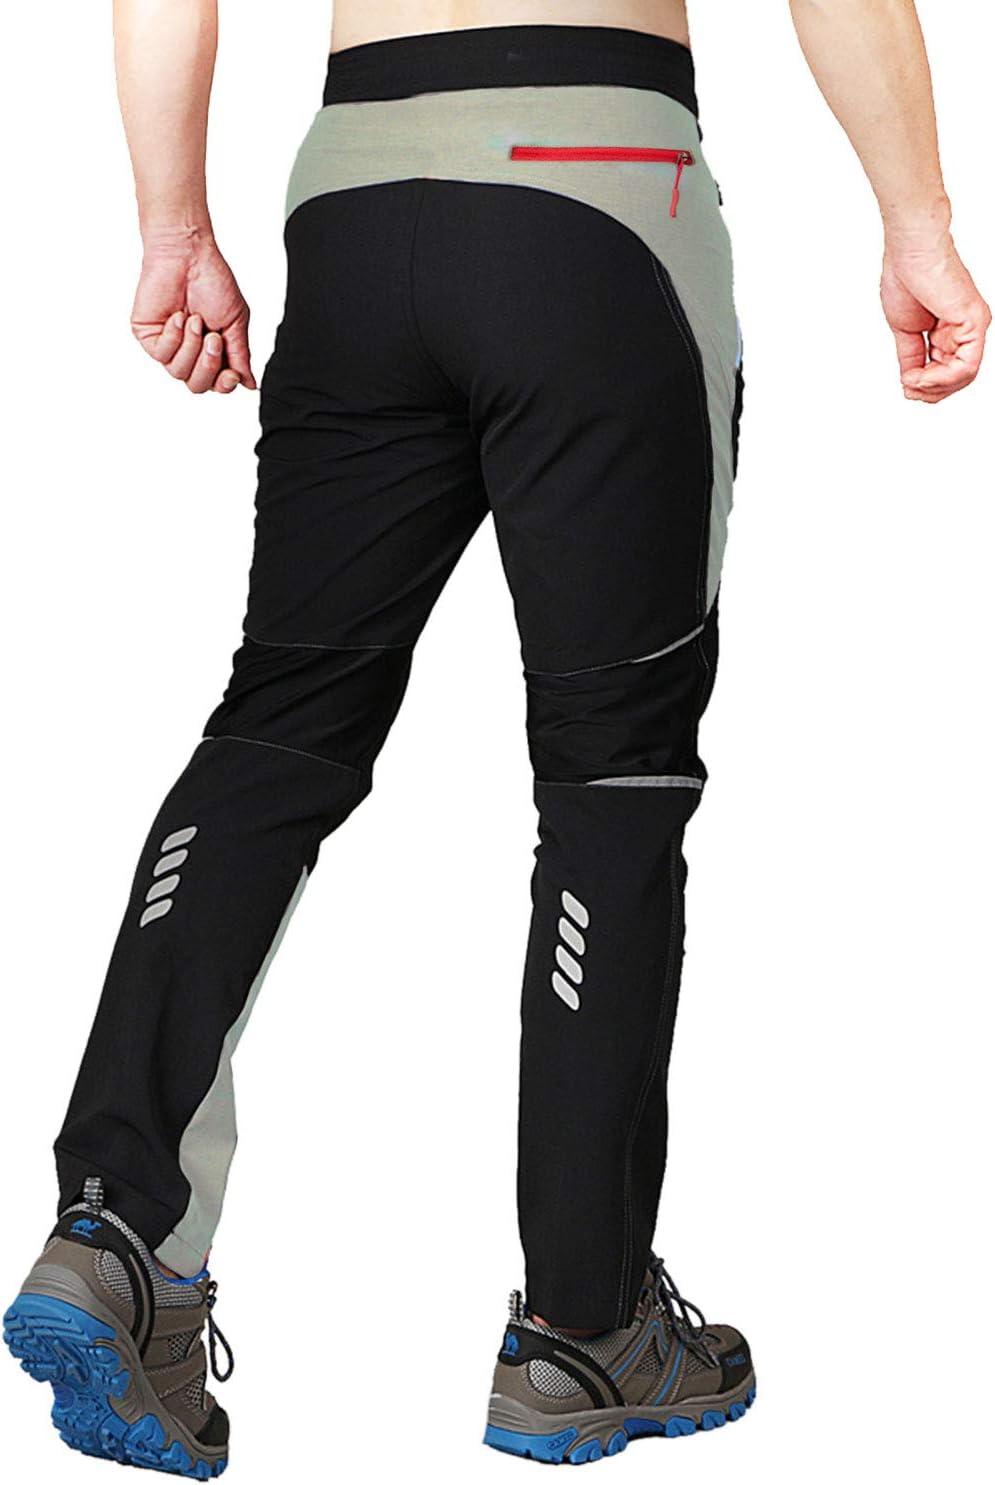 Ynport Crefreak Ciclismo Pantalones para Hombre Pantalones de ...